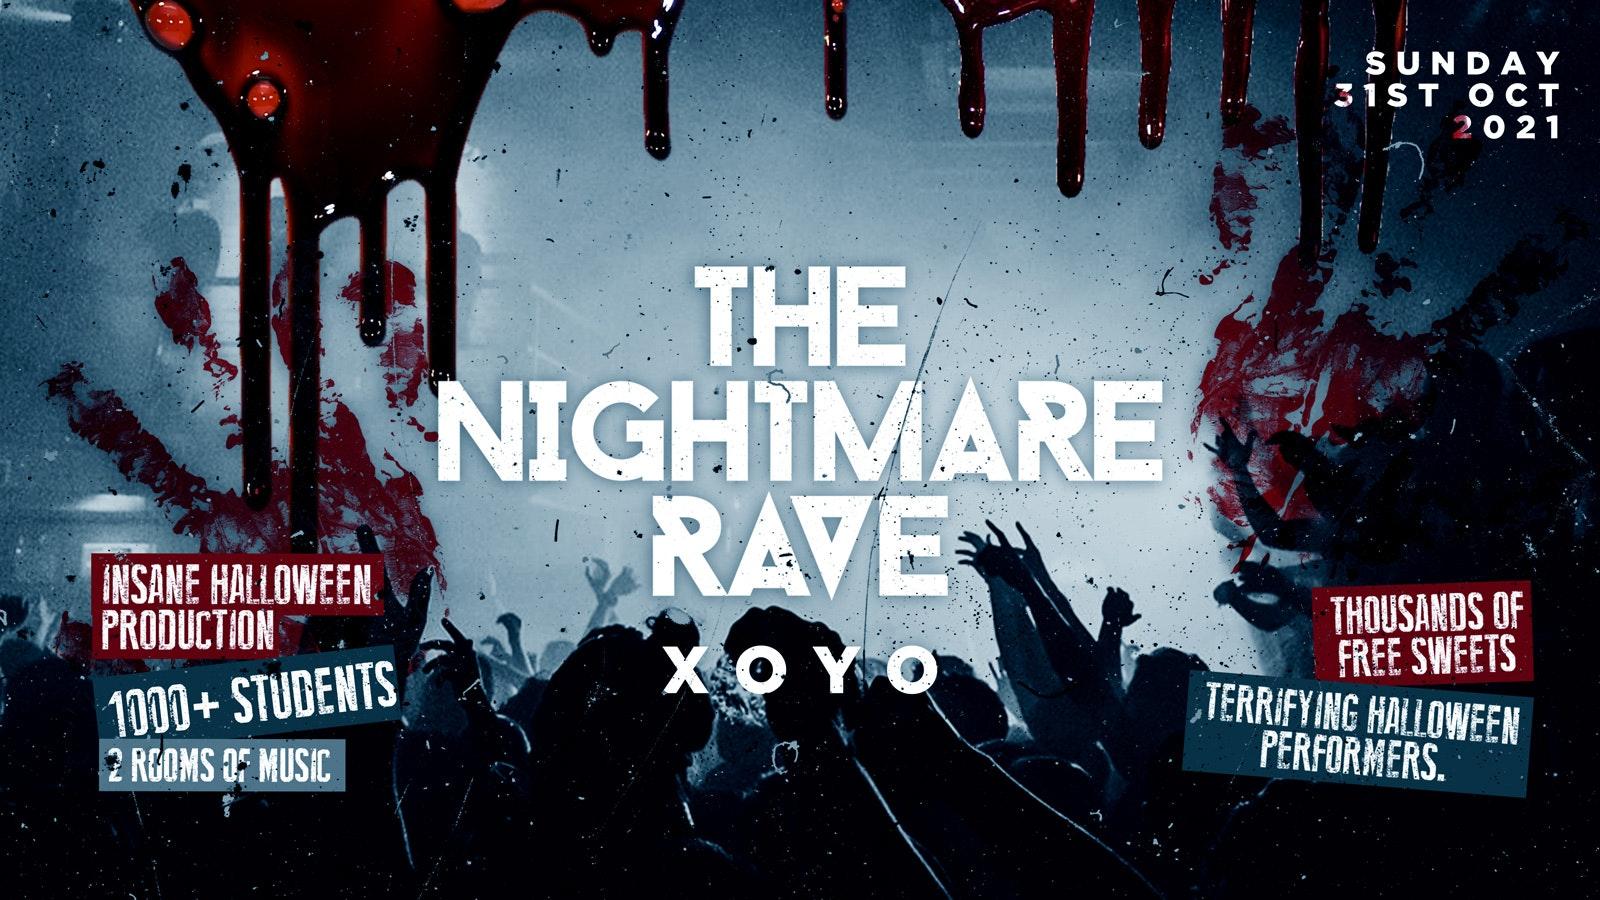 The Nightmare Rave @ XOYO | London Halloween 2021